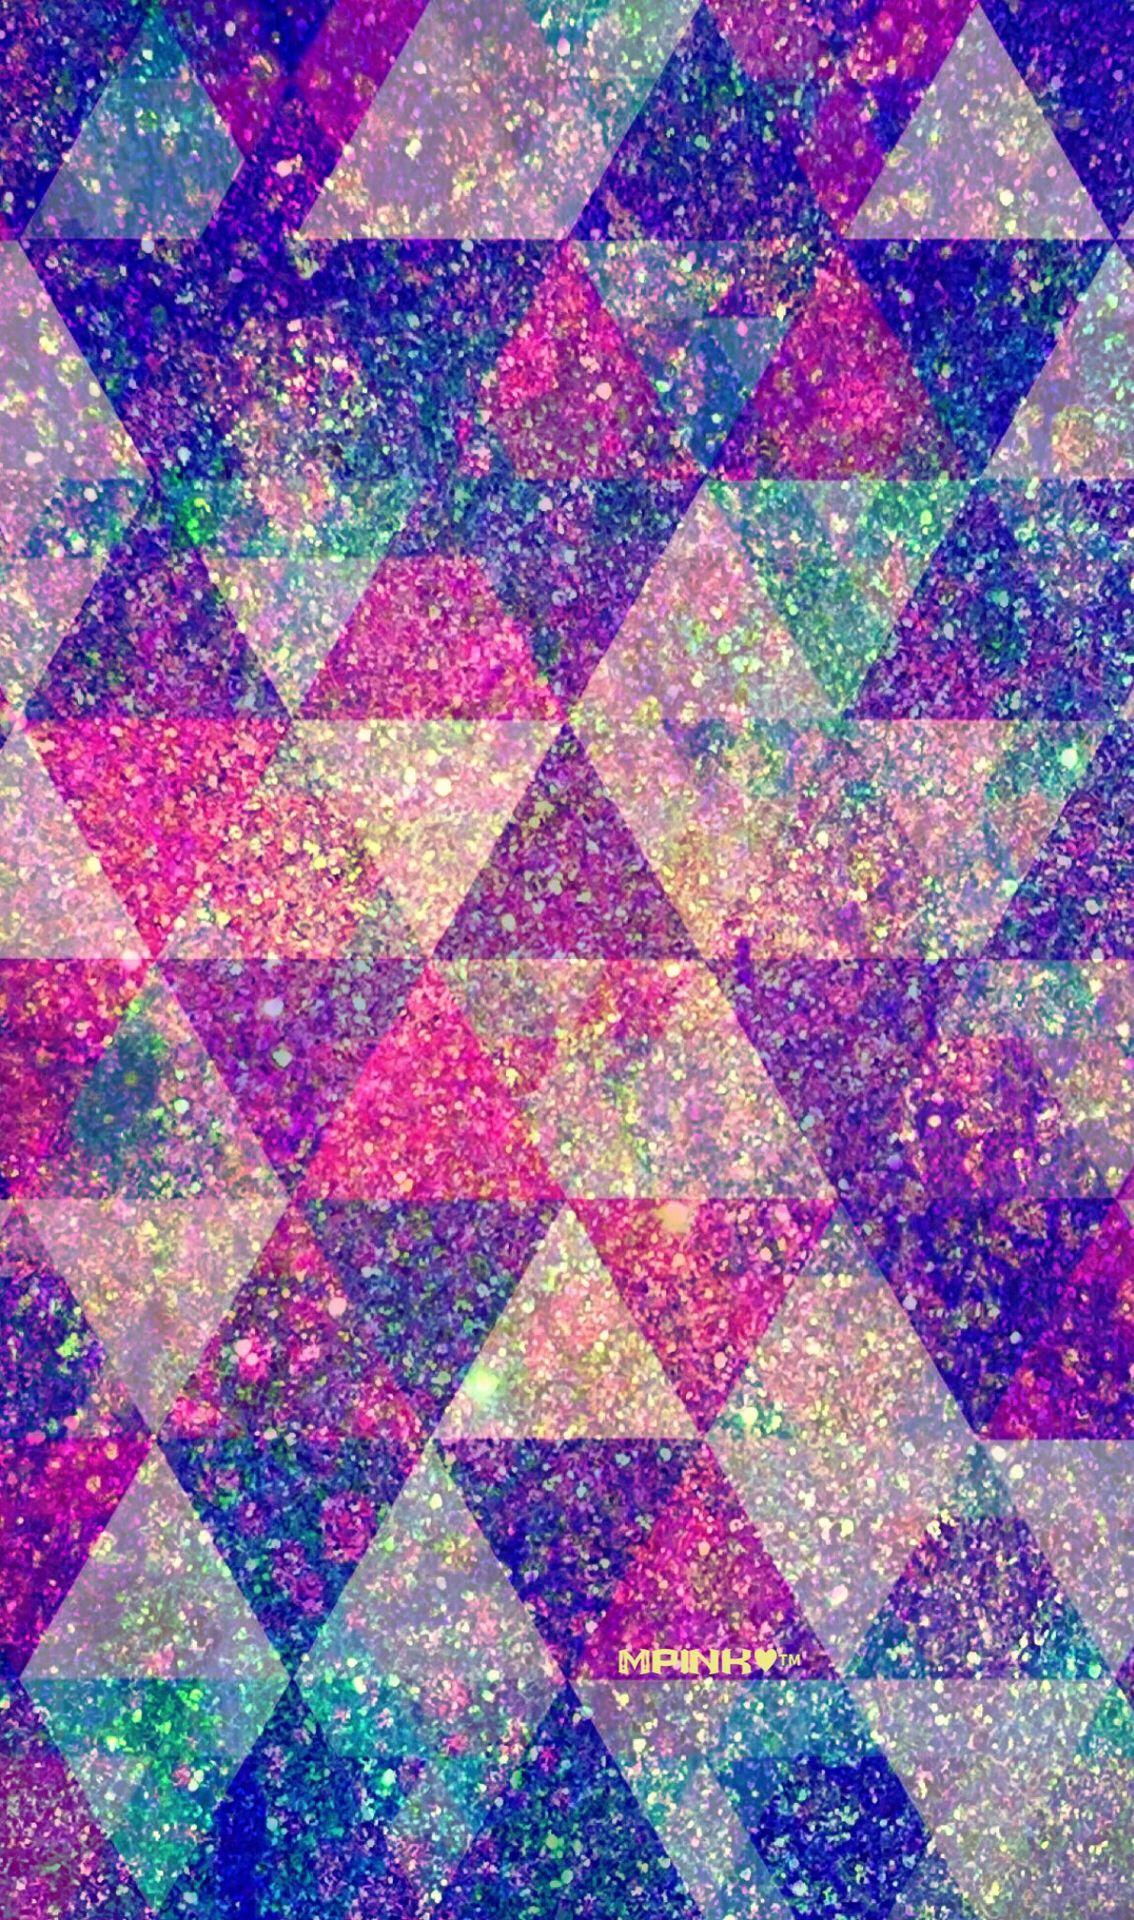 Glitter Tribal Galaxy Wallpaper Androidwallpaper Iphonewallpaper Wallpaper Galaxy Sparkle G Galaxy Wallpaper New Wallpaper Iphone Glitter Phone Wallpaper